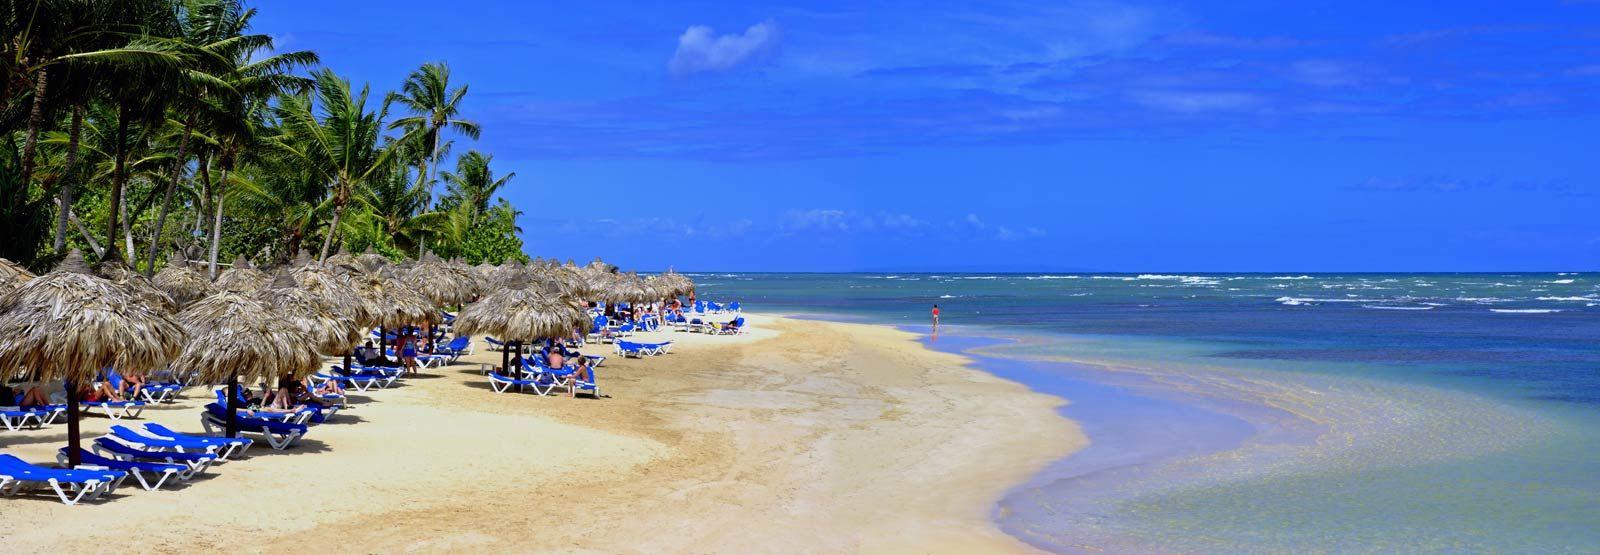 Hotel Beaches Samana Grand Bahia Principe El Portillo Bahia Beach Resort